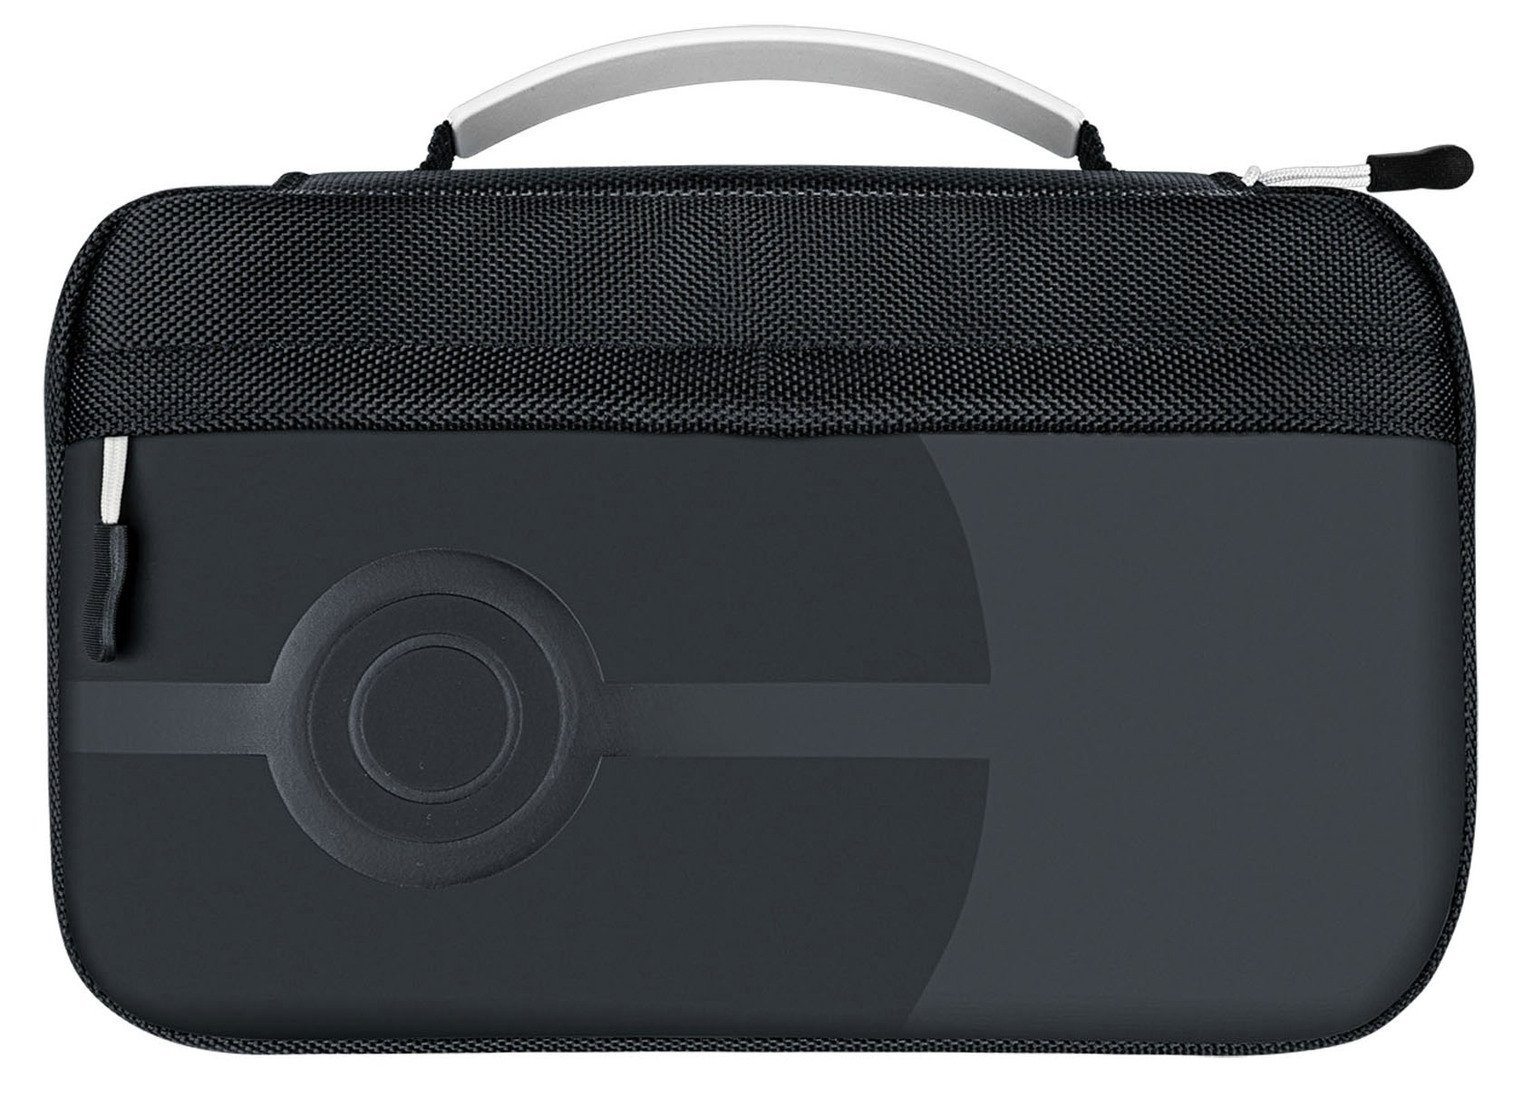 Nintendo Switch Pokeball Commuter Case